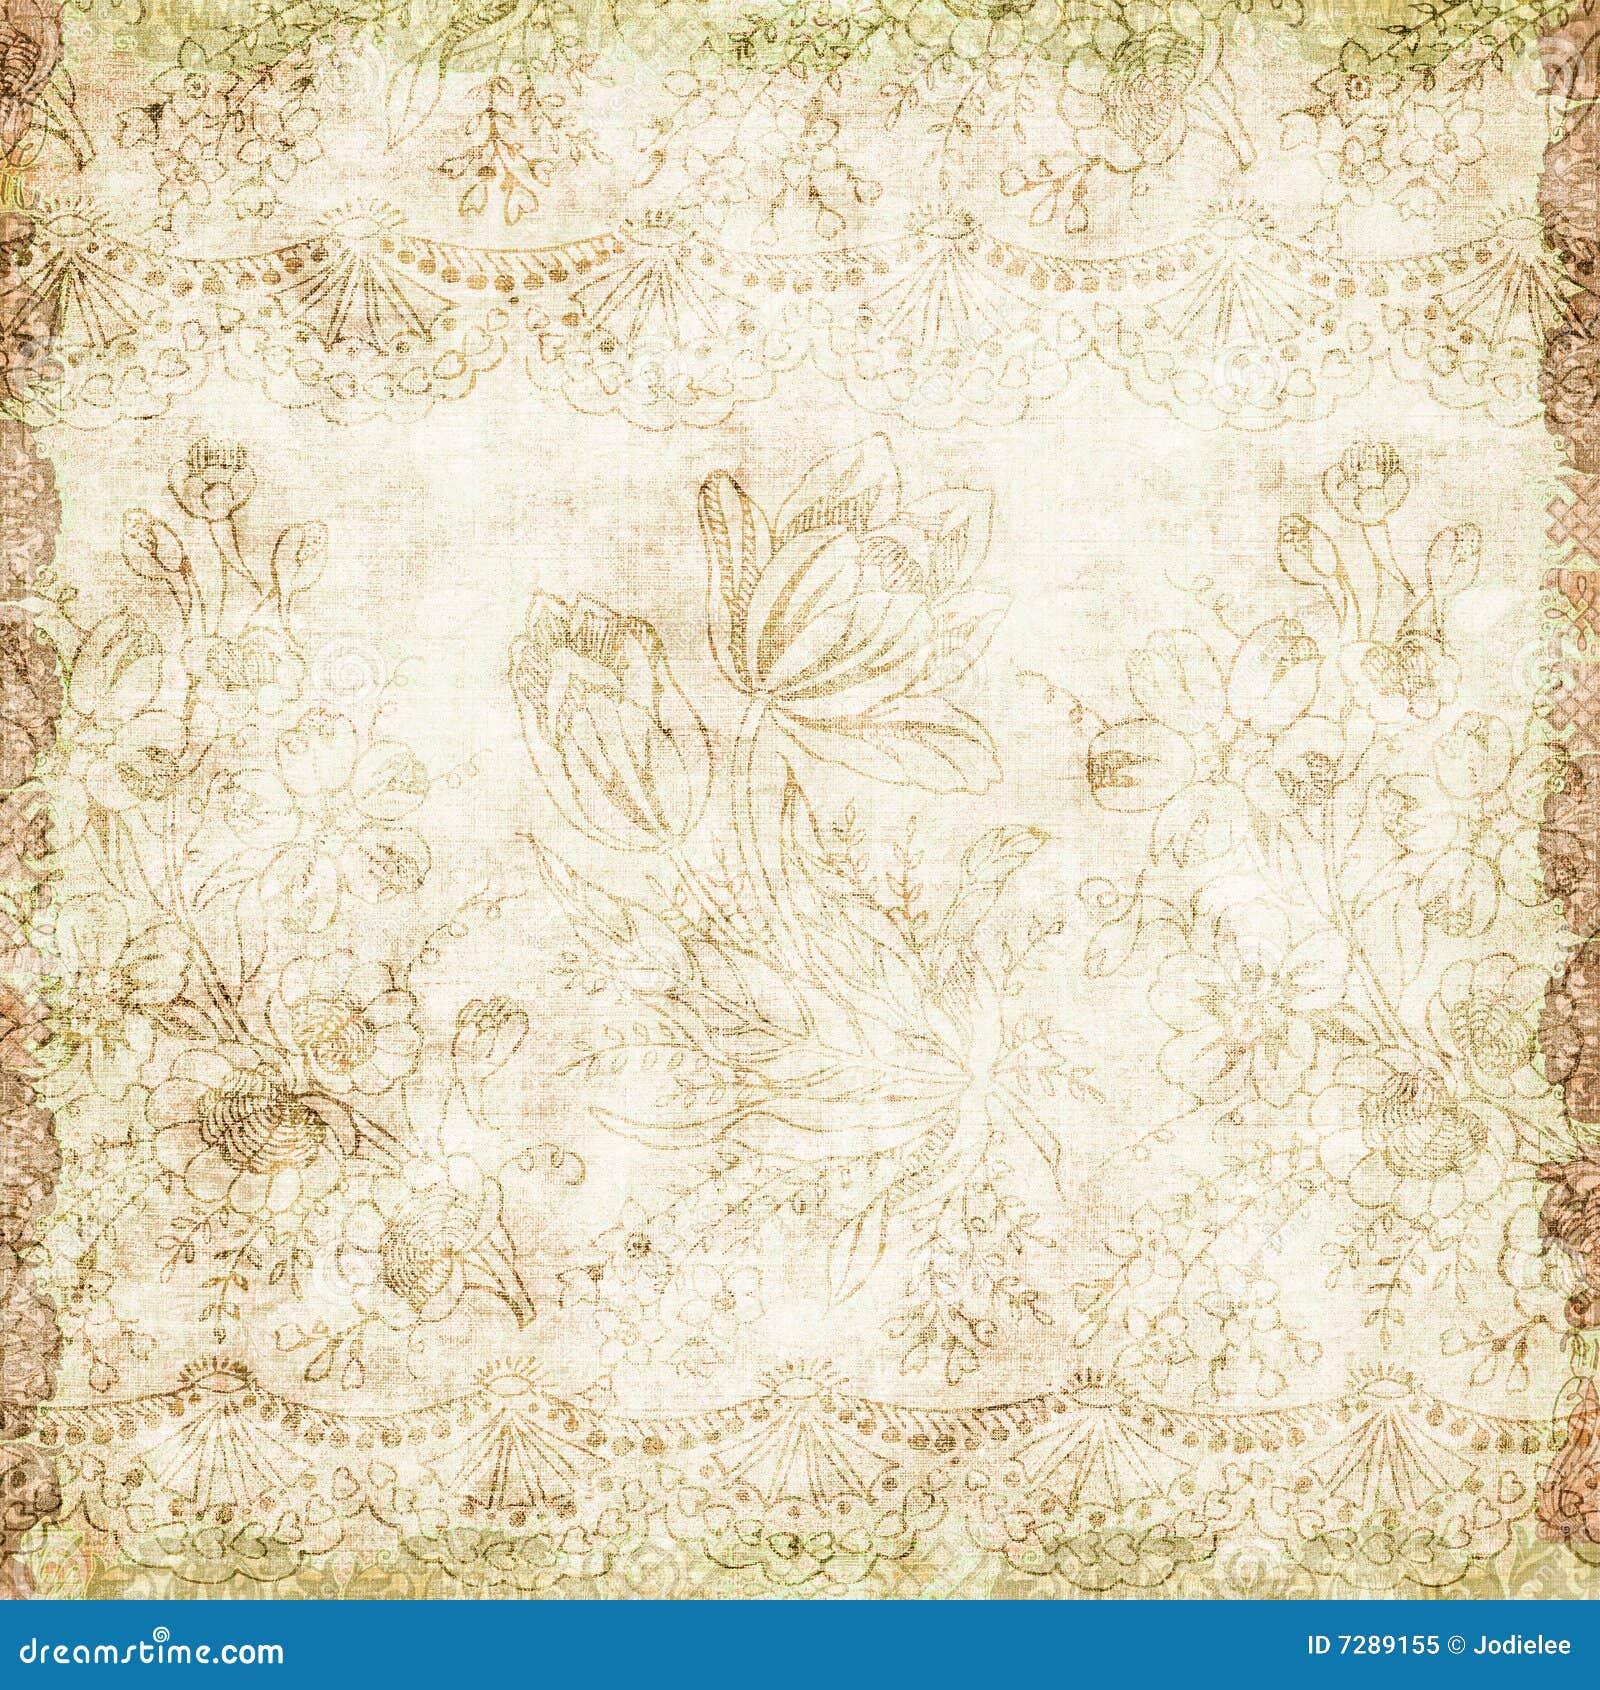 Floral vintage background - Vintage Floral Antique Background Theme Royalty Free Stock Photo